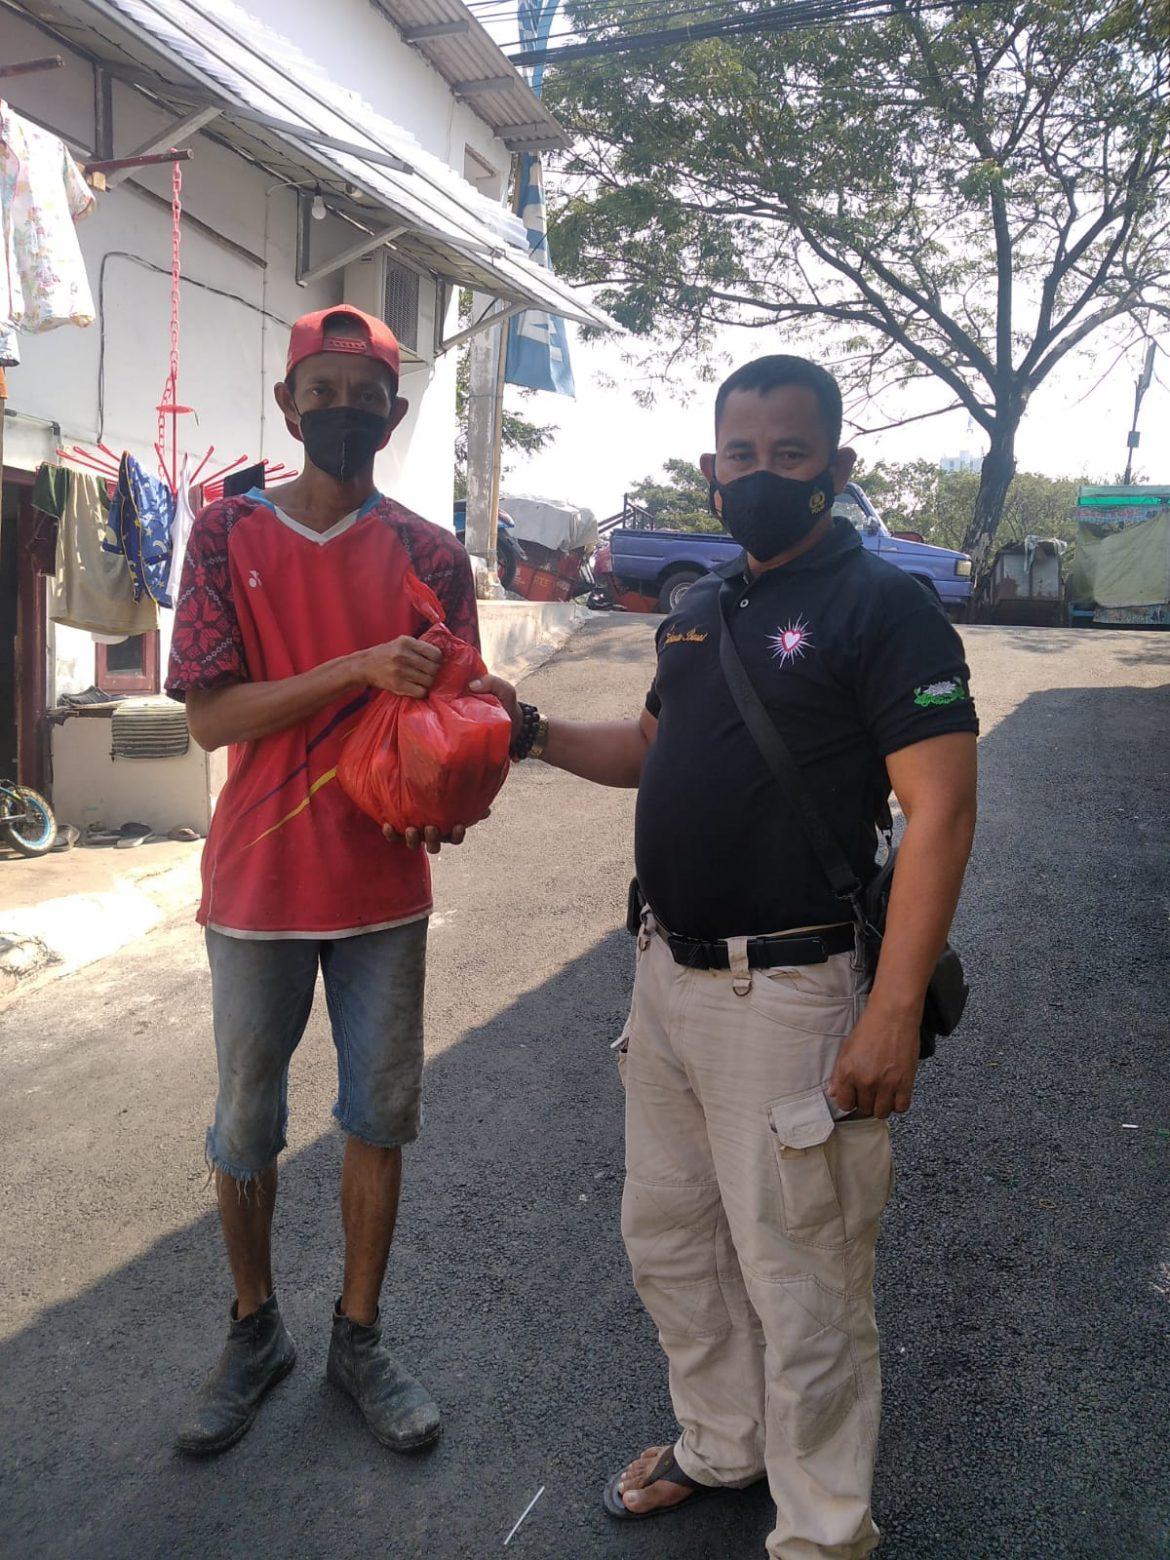 Aksi Peduli: Ketua DPP LPPK DKI Jakarta Salurkan Batuan Paket Sembako kepada Warga Tidak Mampu dan Pakir Miskin di Saat Pandemi Covid 19